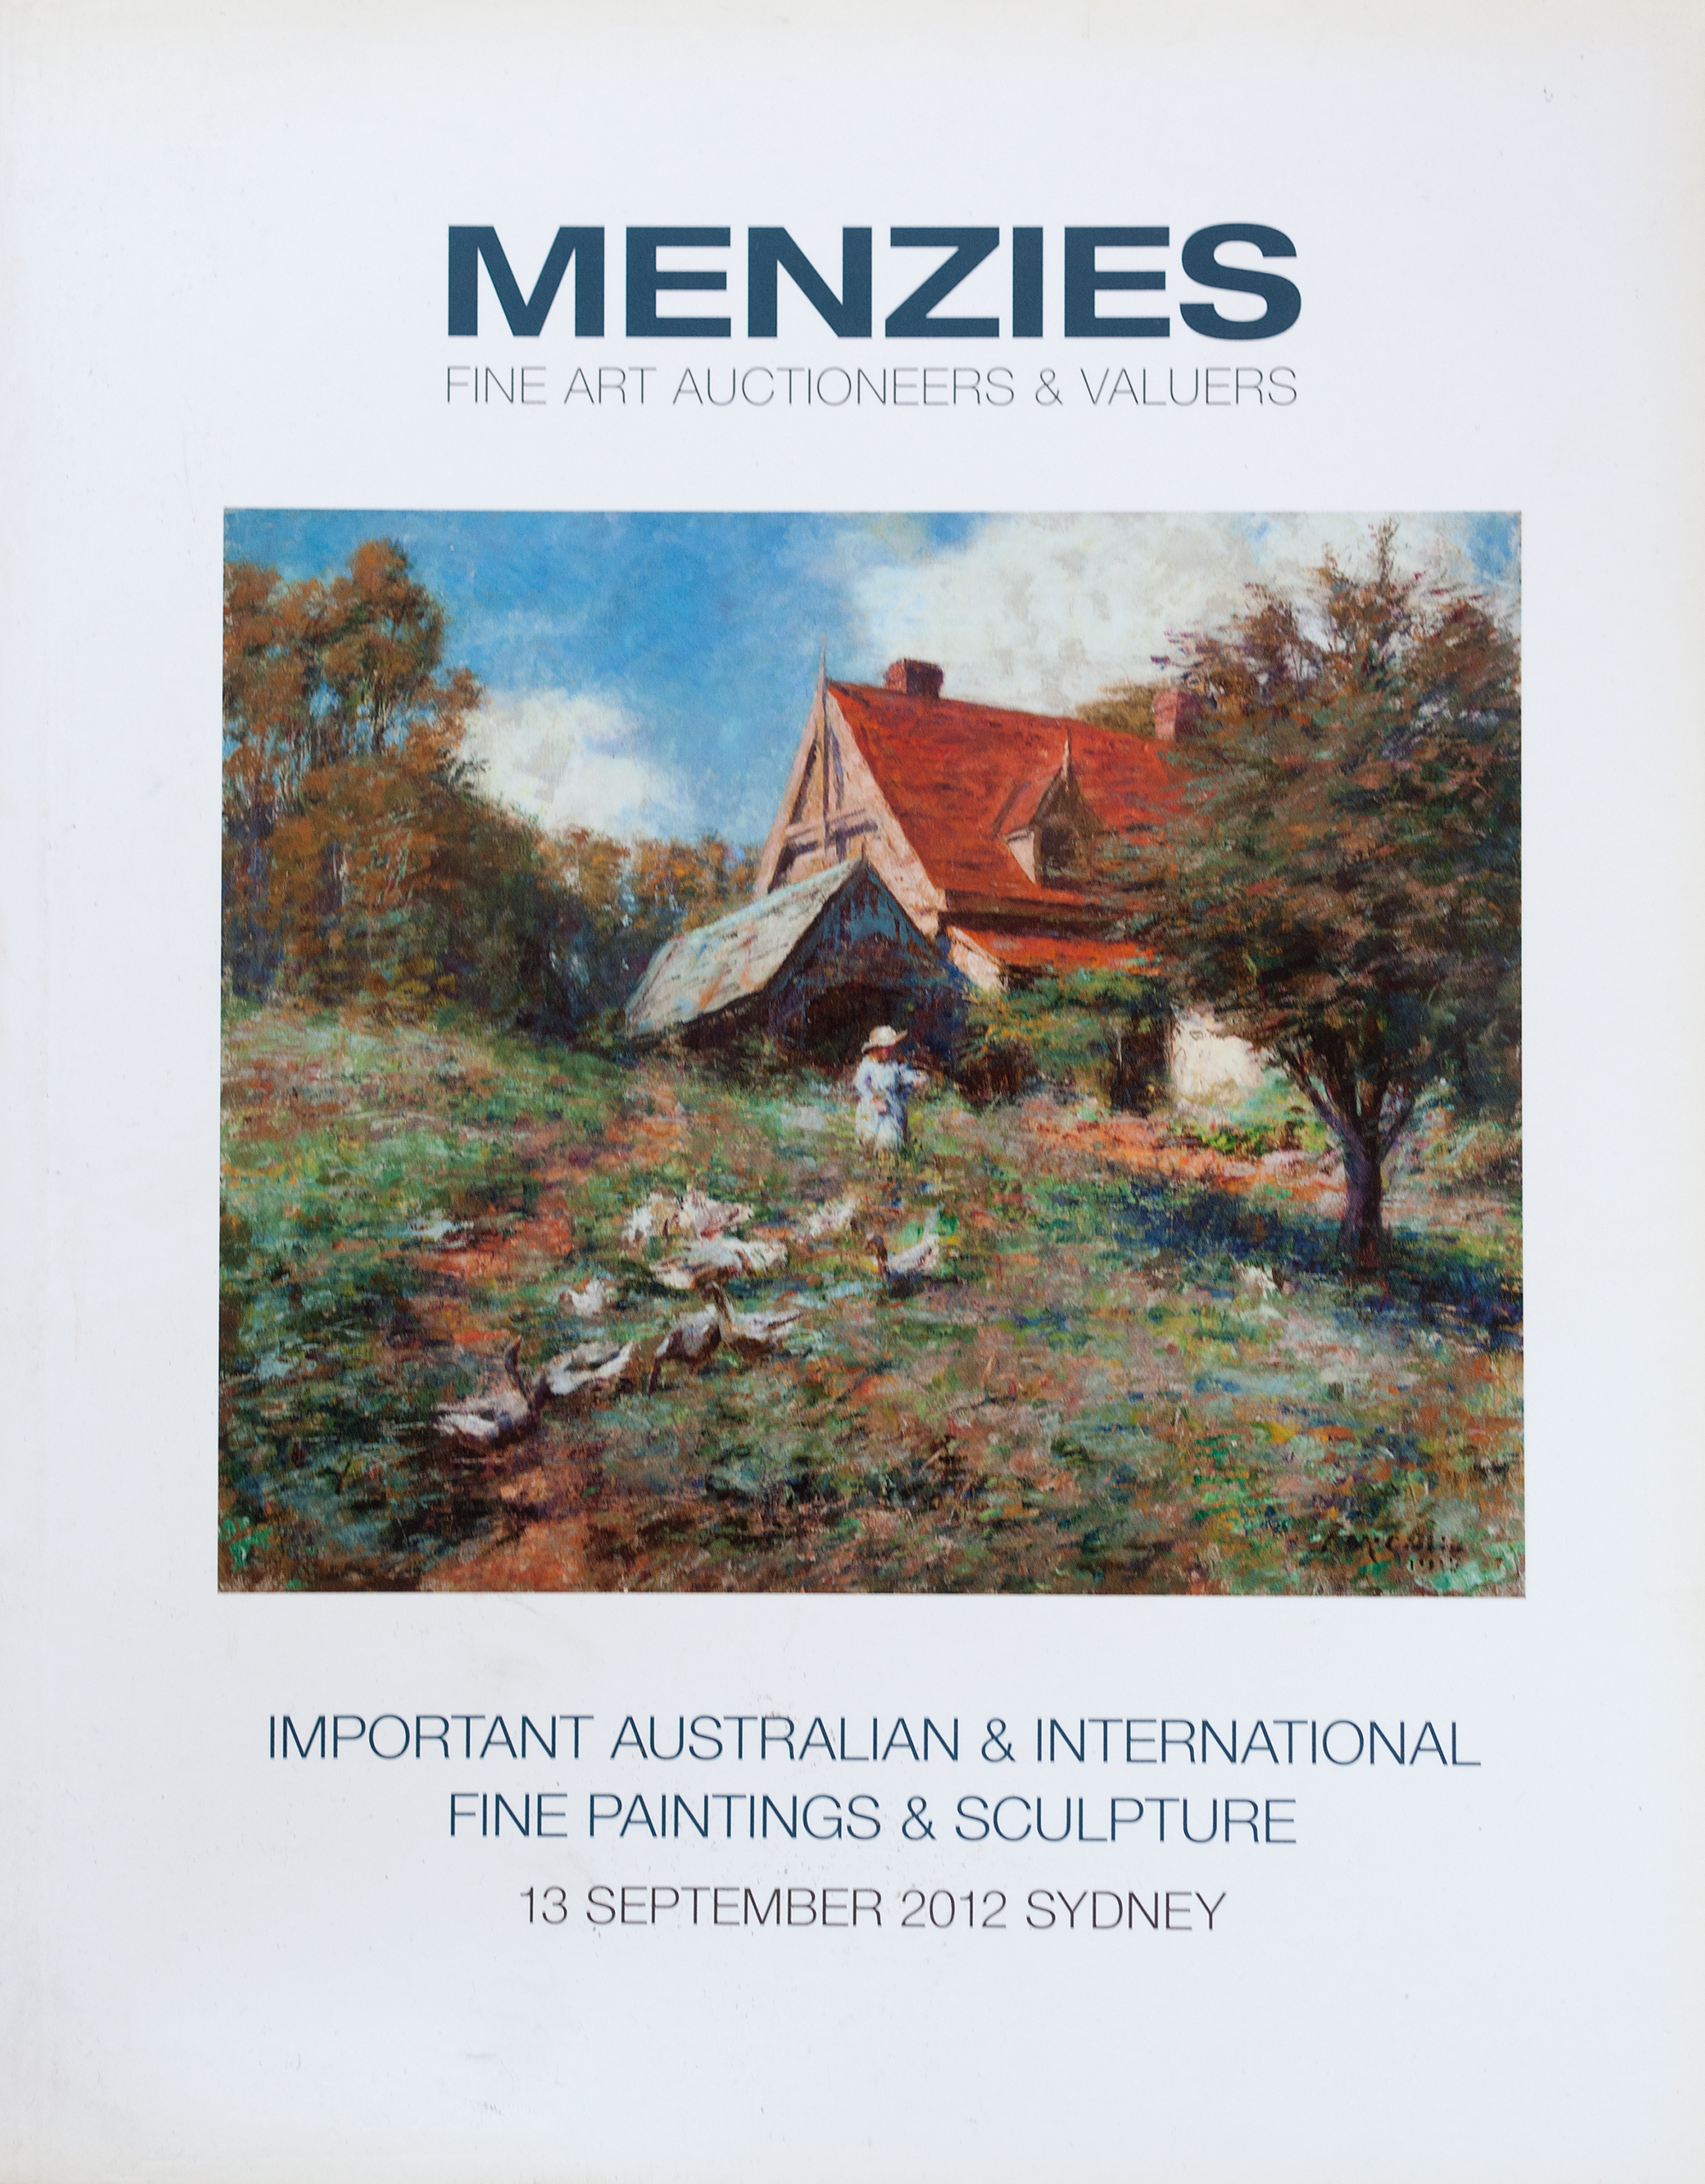 171023 Menzies Catalogues_020.jpg